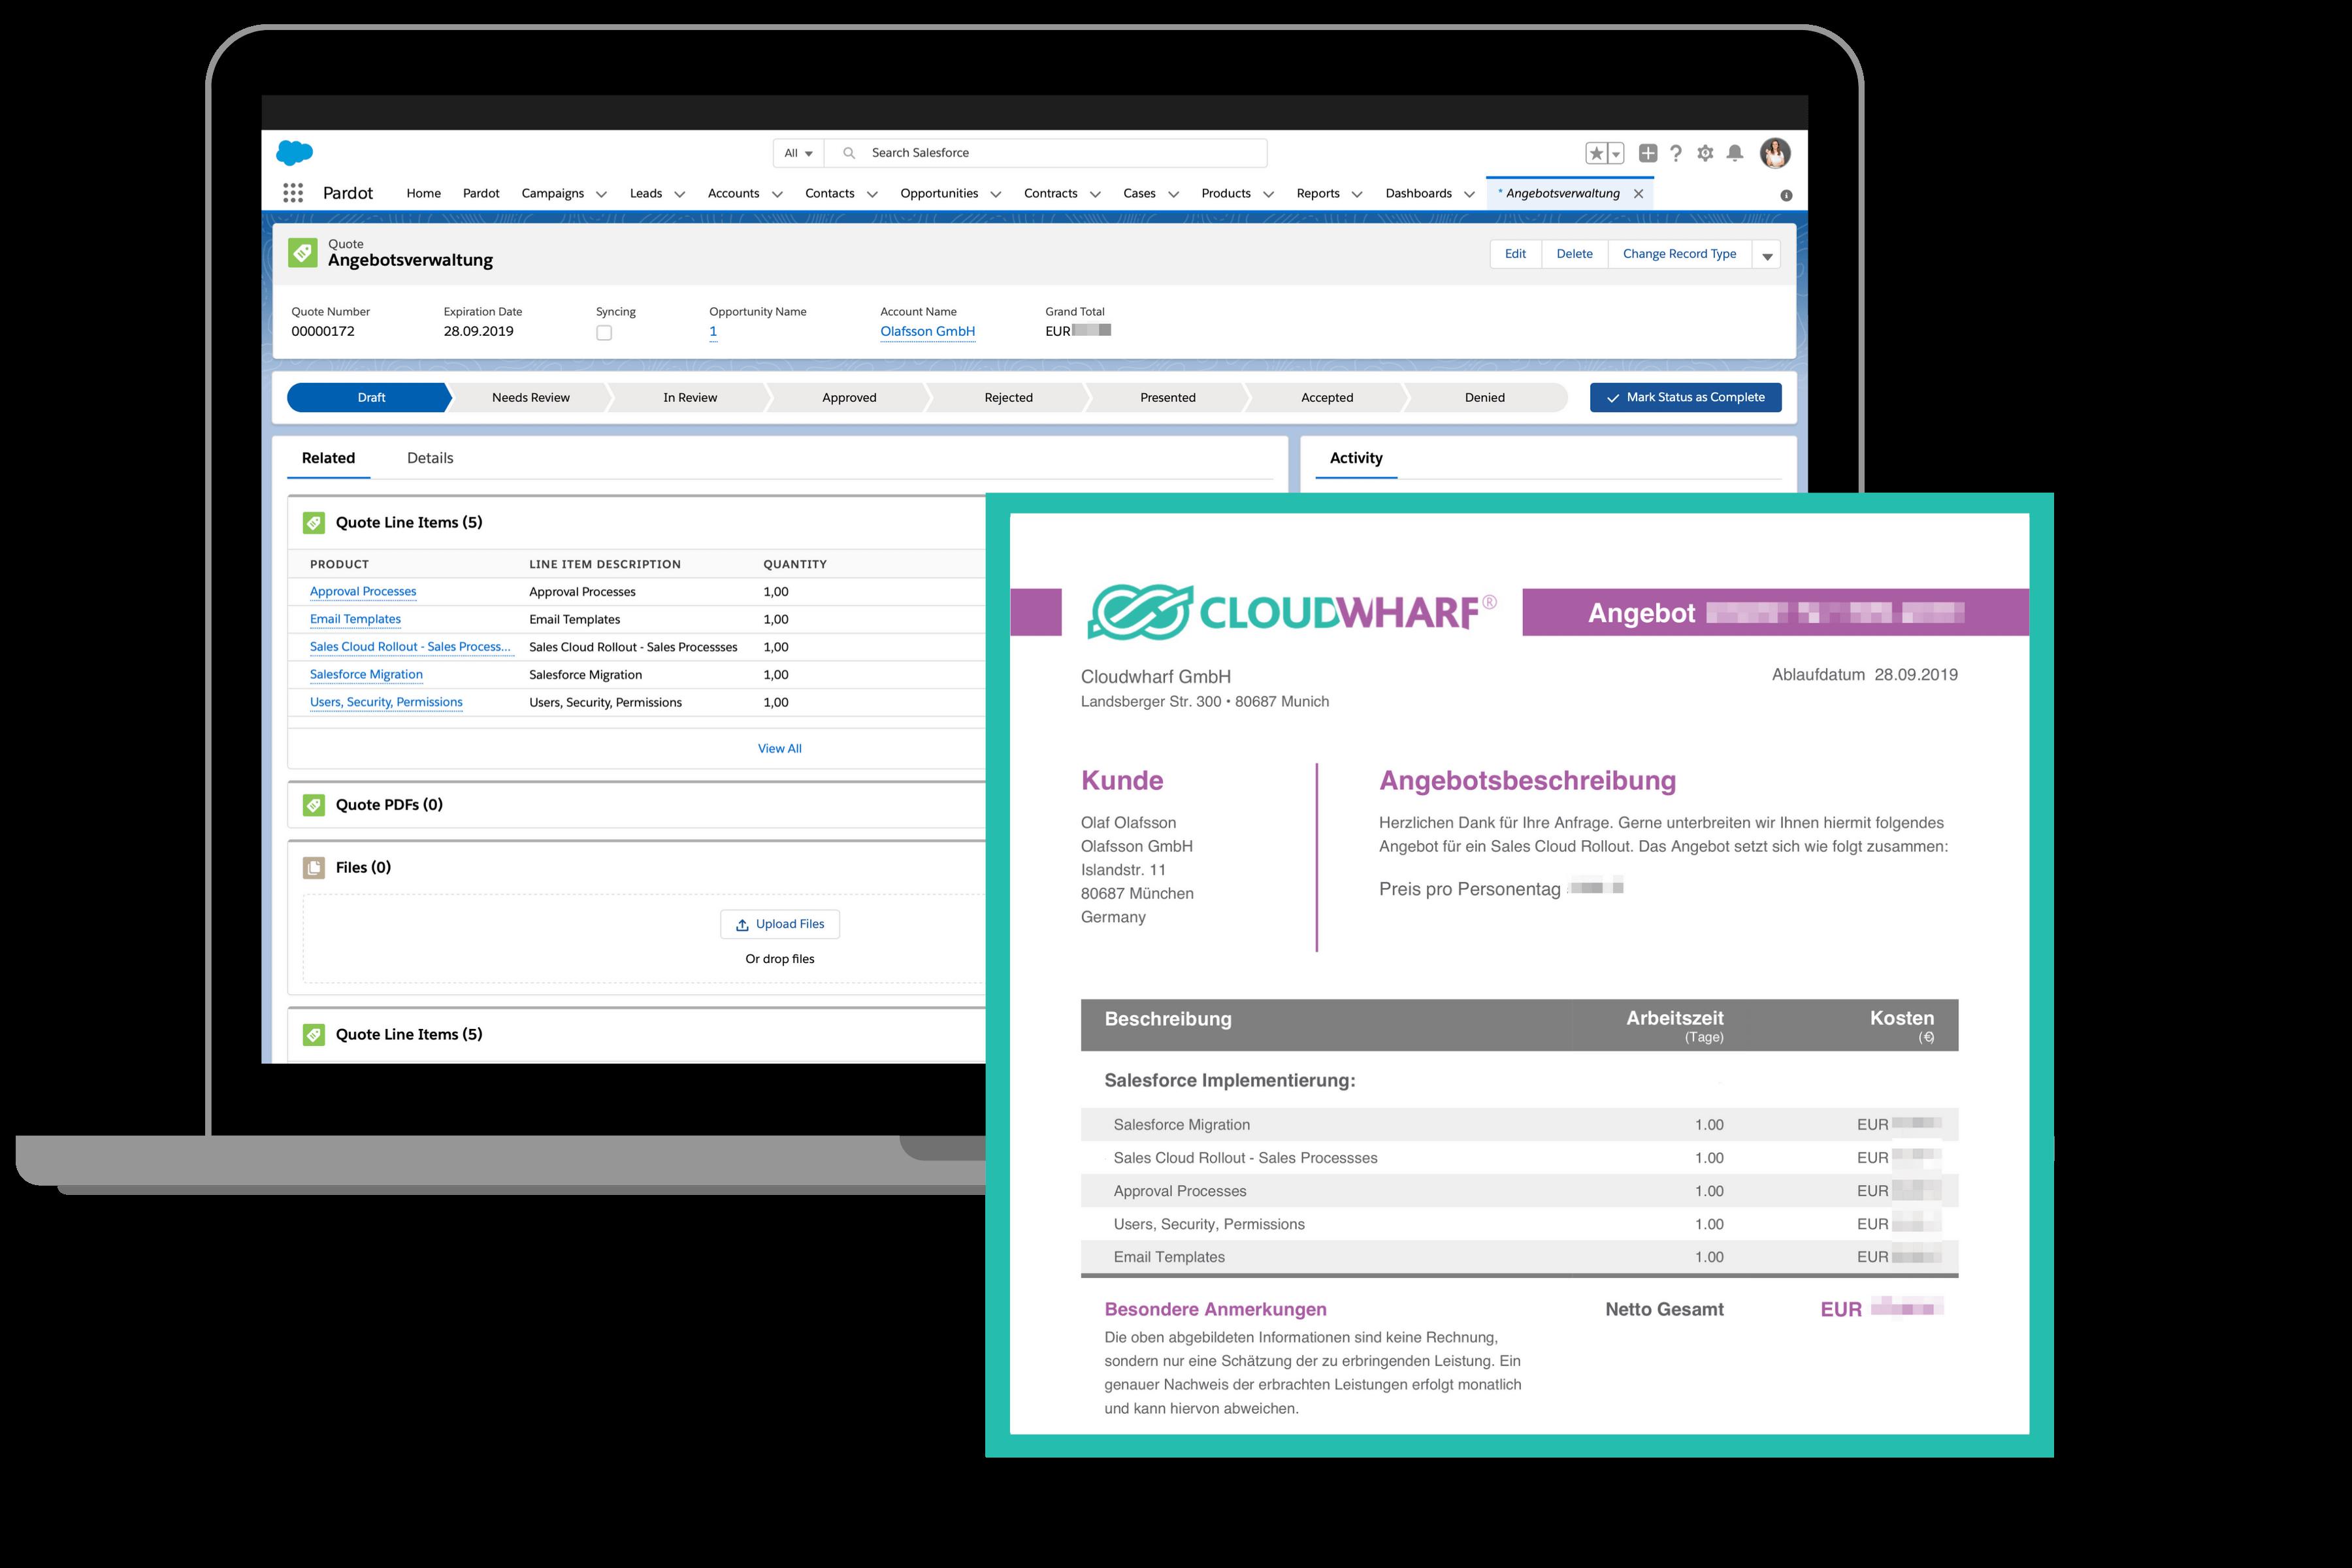 Angebotsverwaltung in Salesforce native Lösung